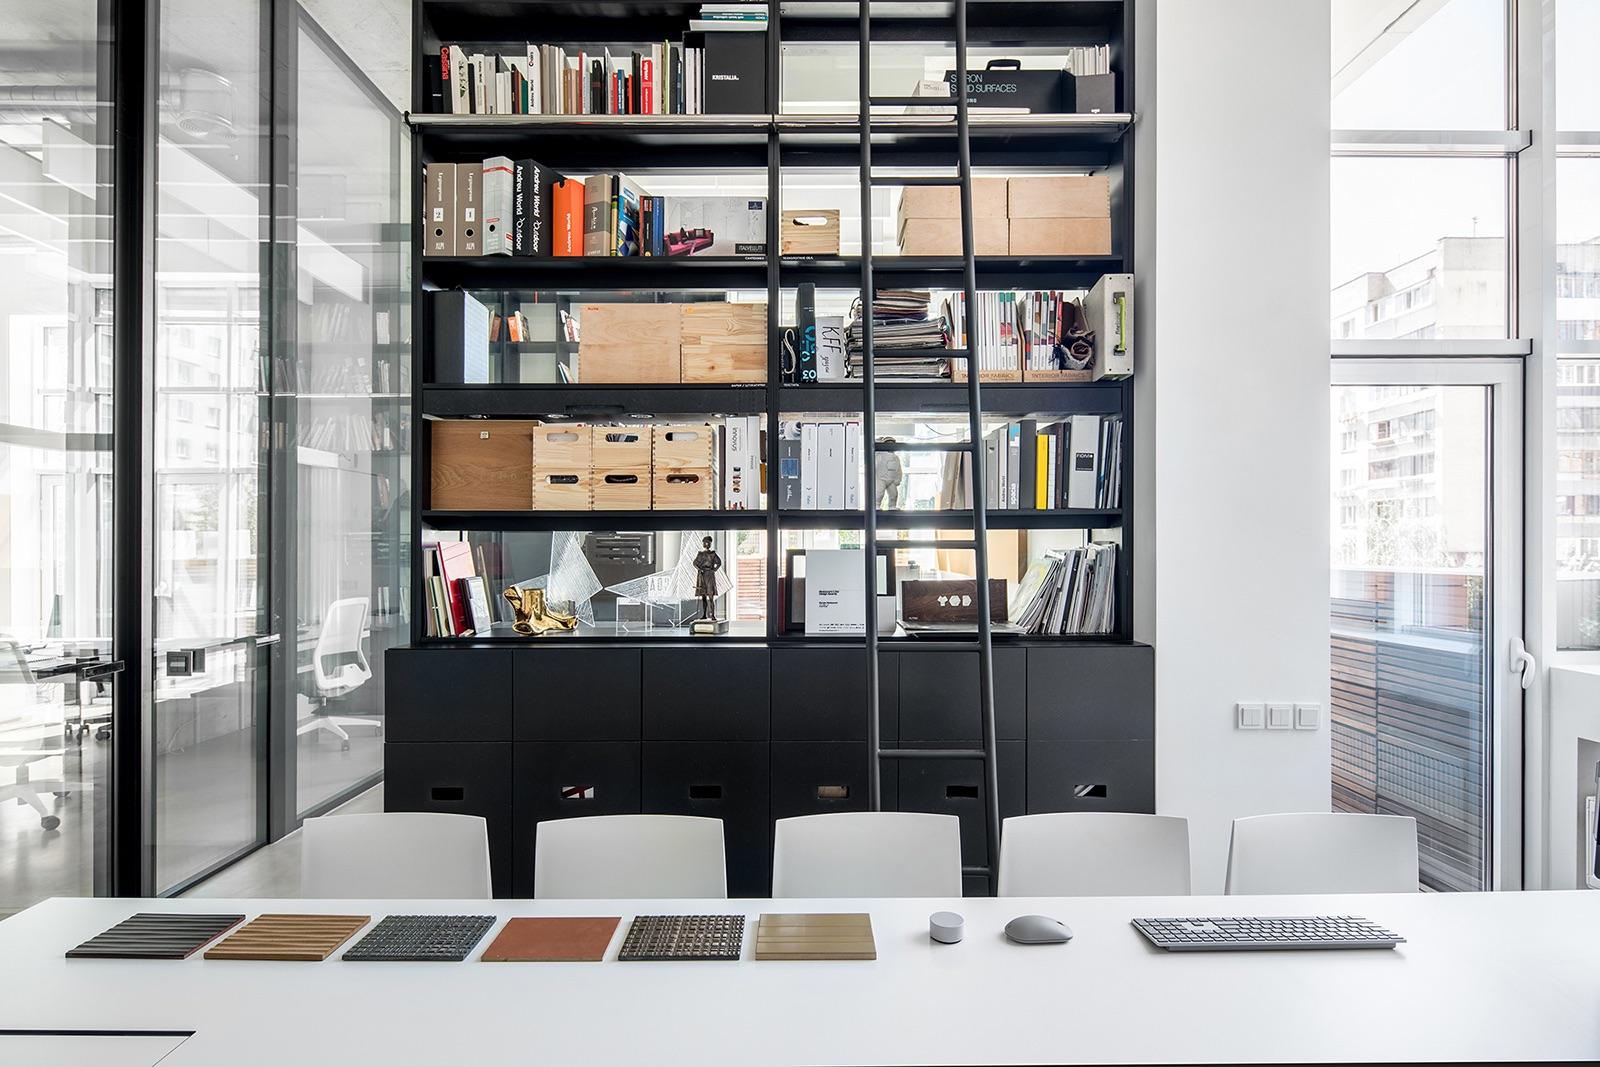 yod-design-lab-office-10